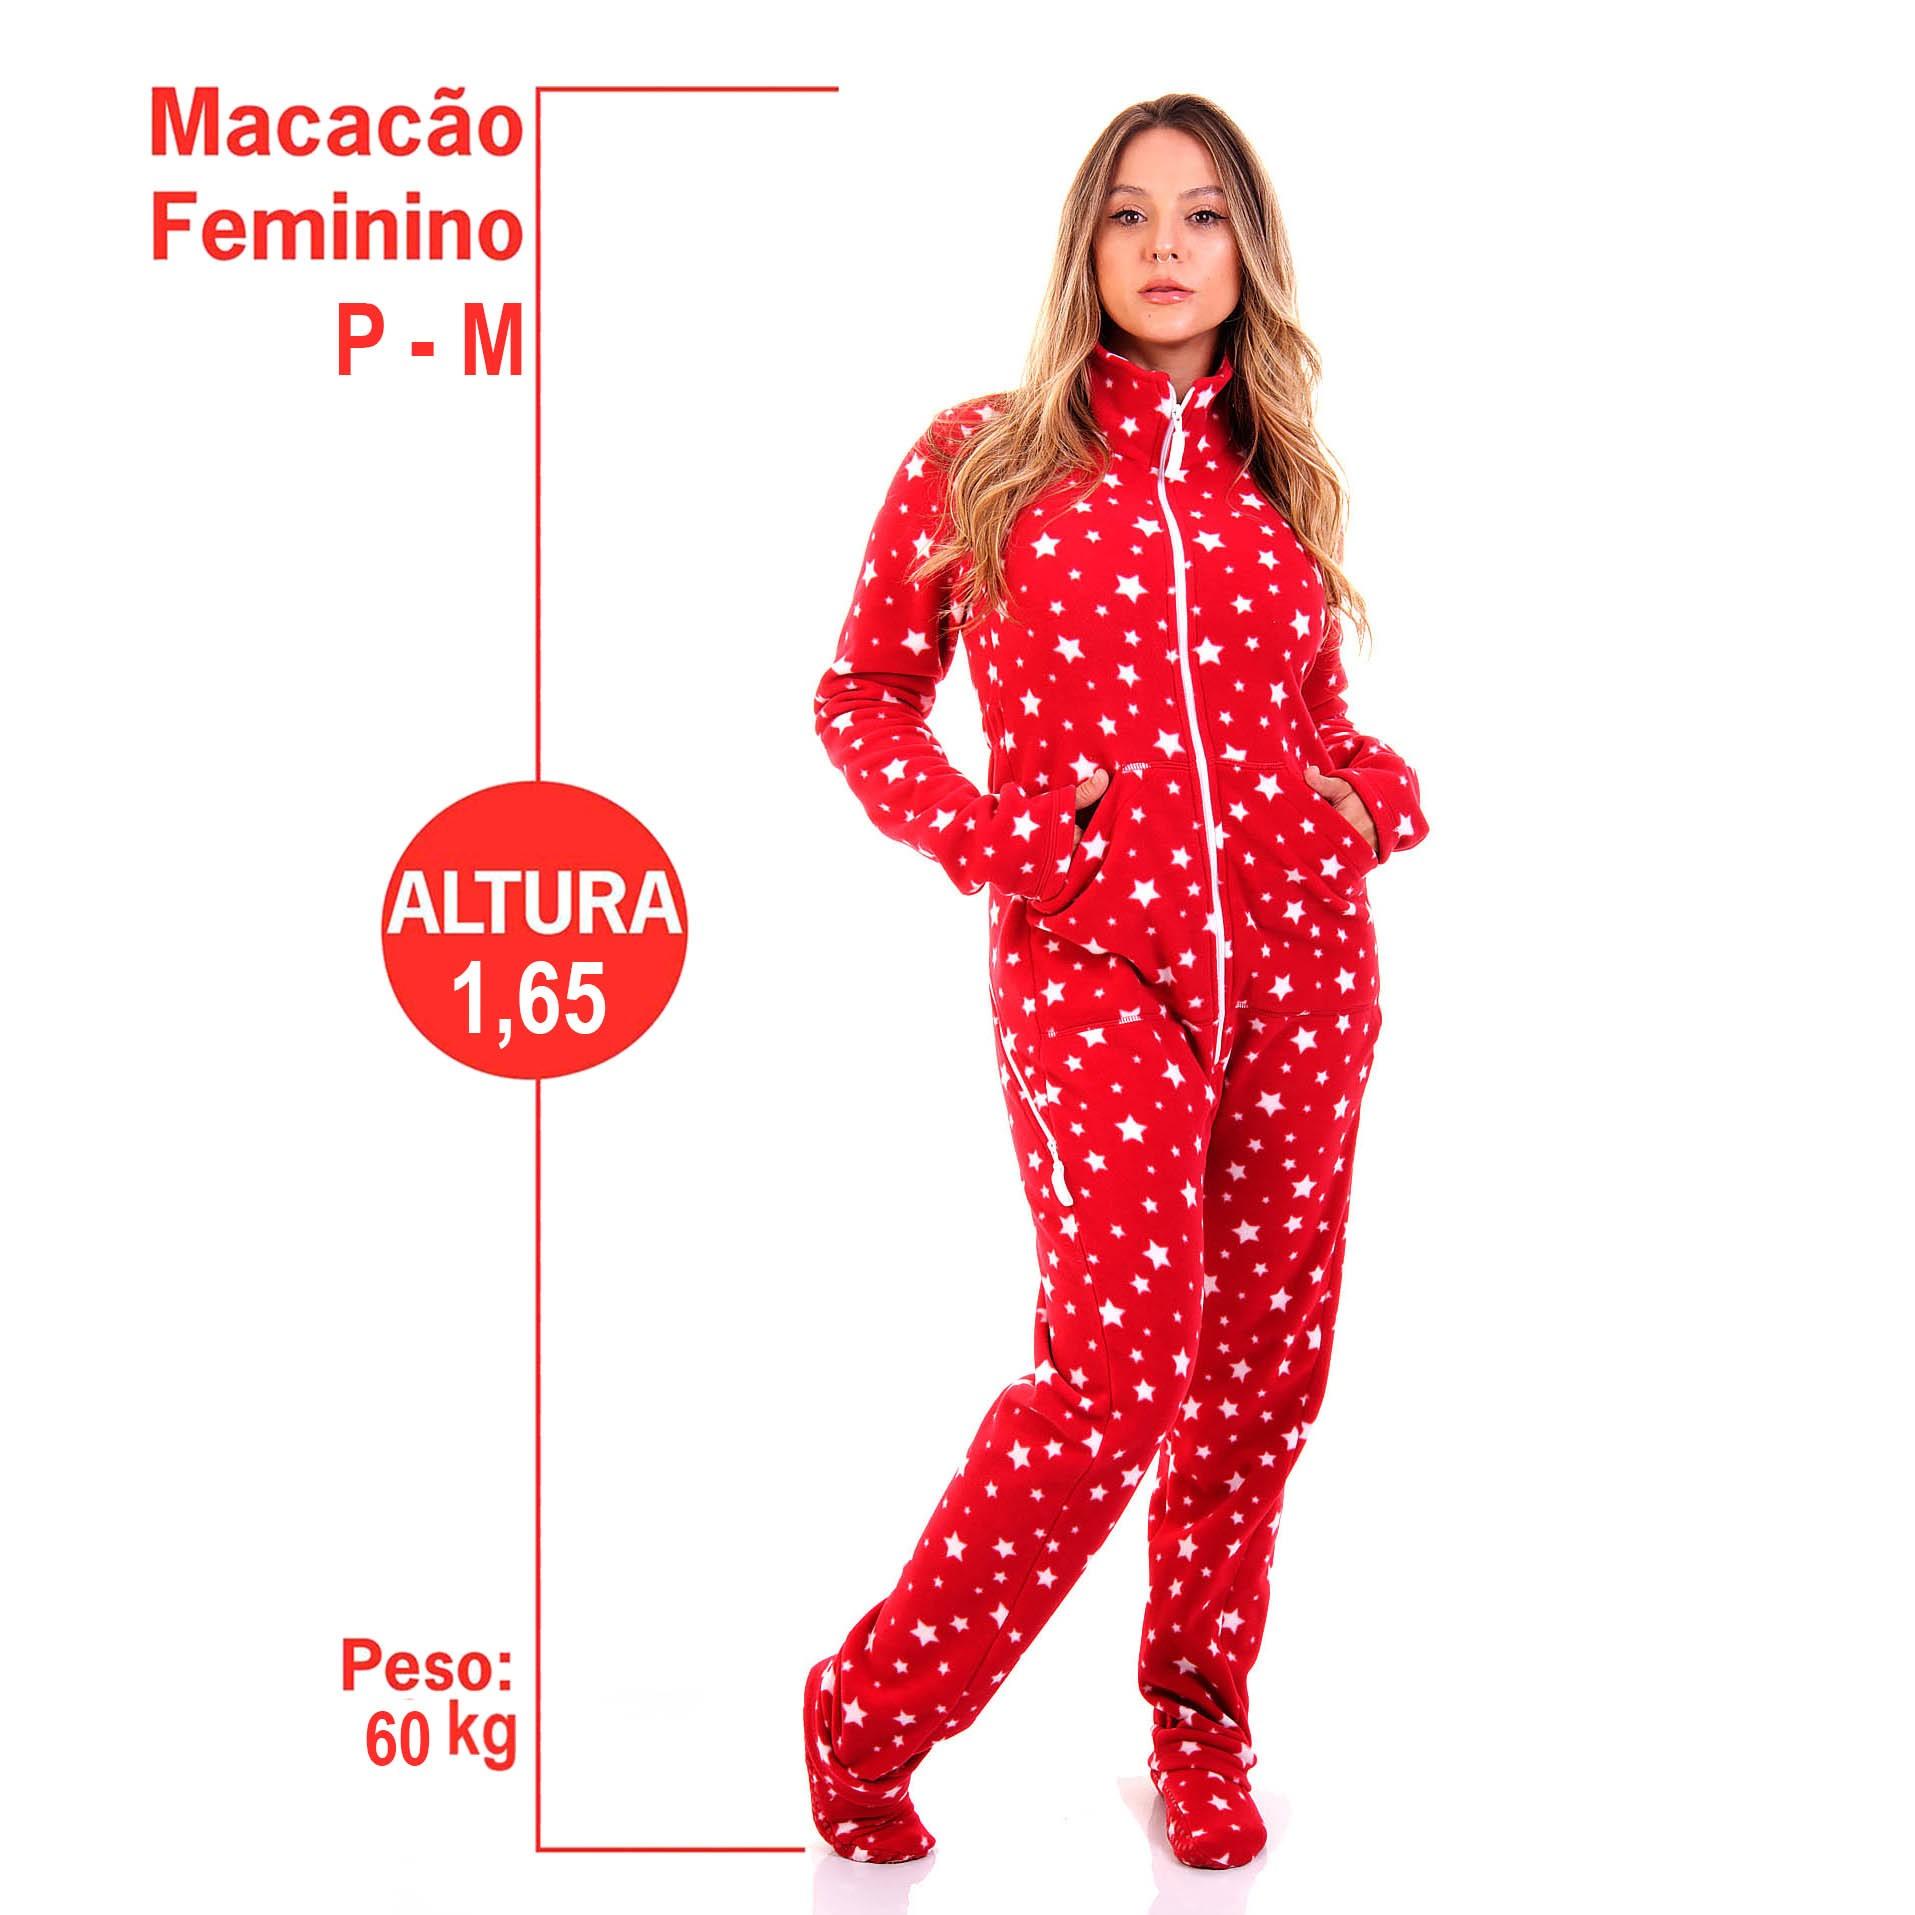 2 PEÇAS - TAL MÃE TAL FILHO (A) MACACÃO STAR